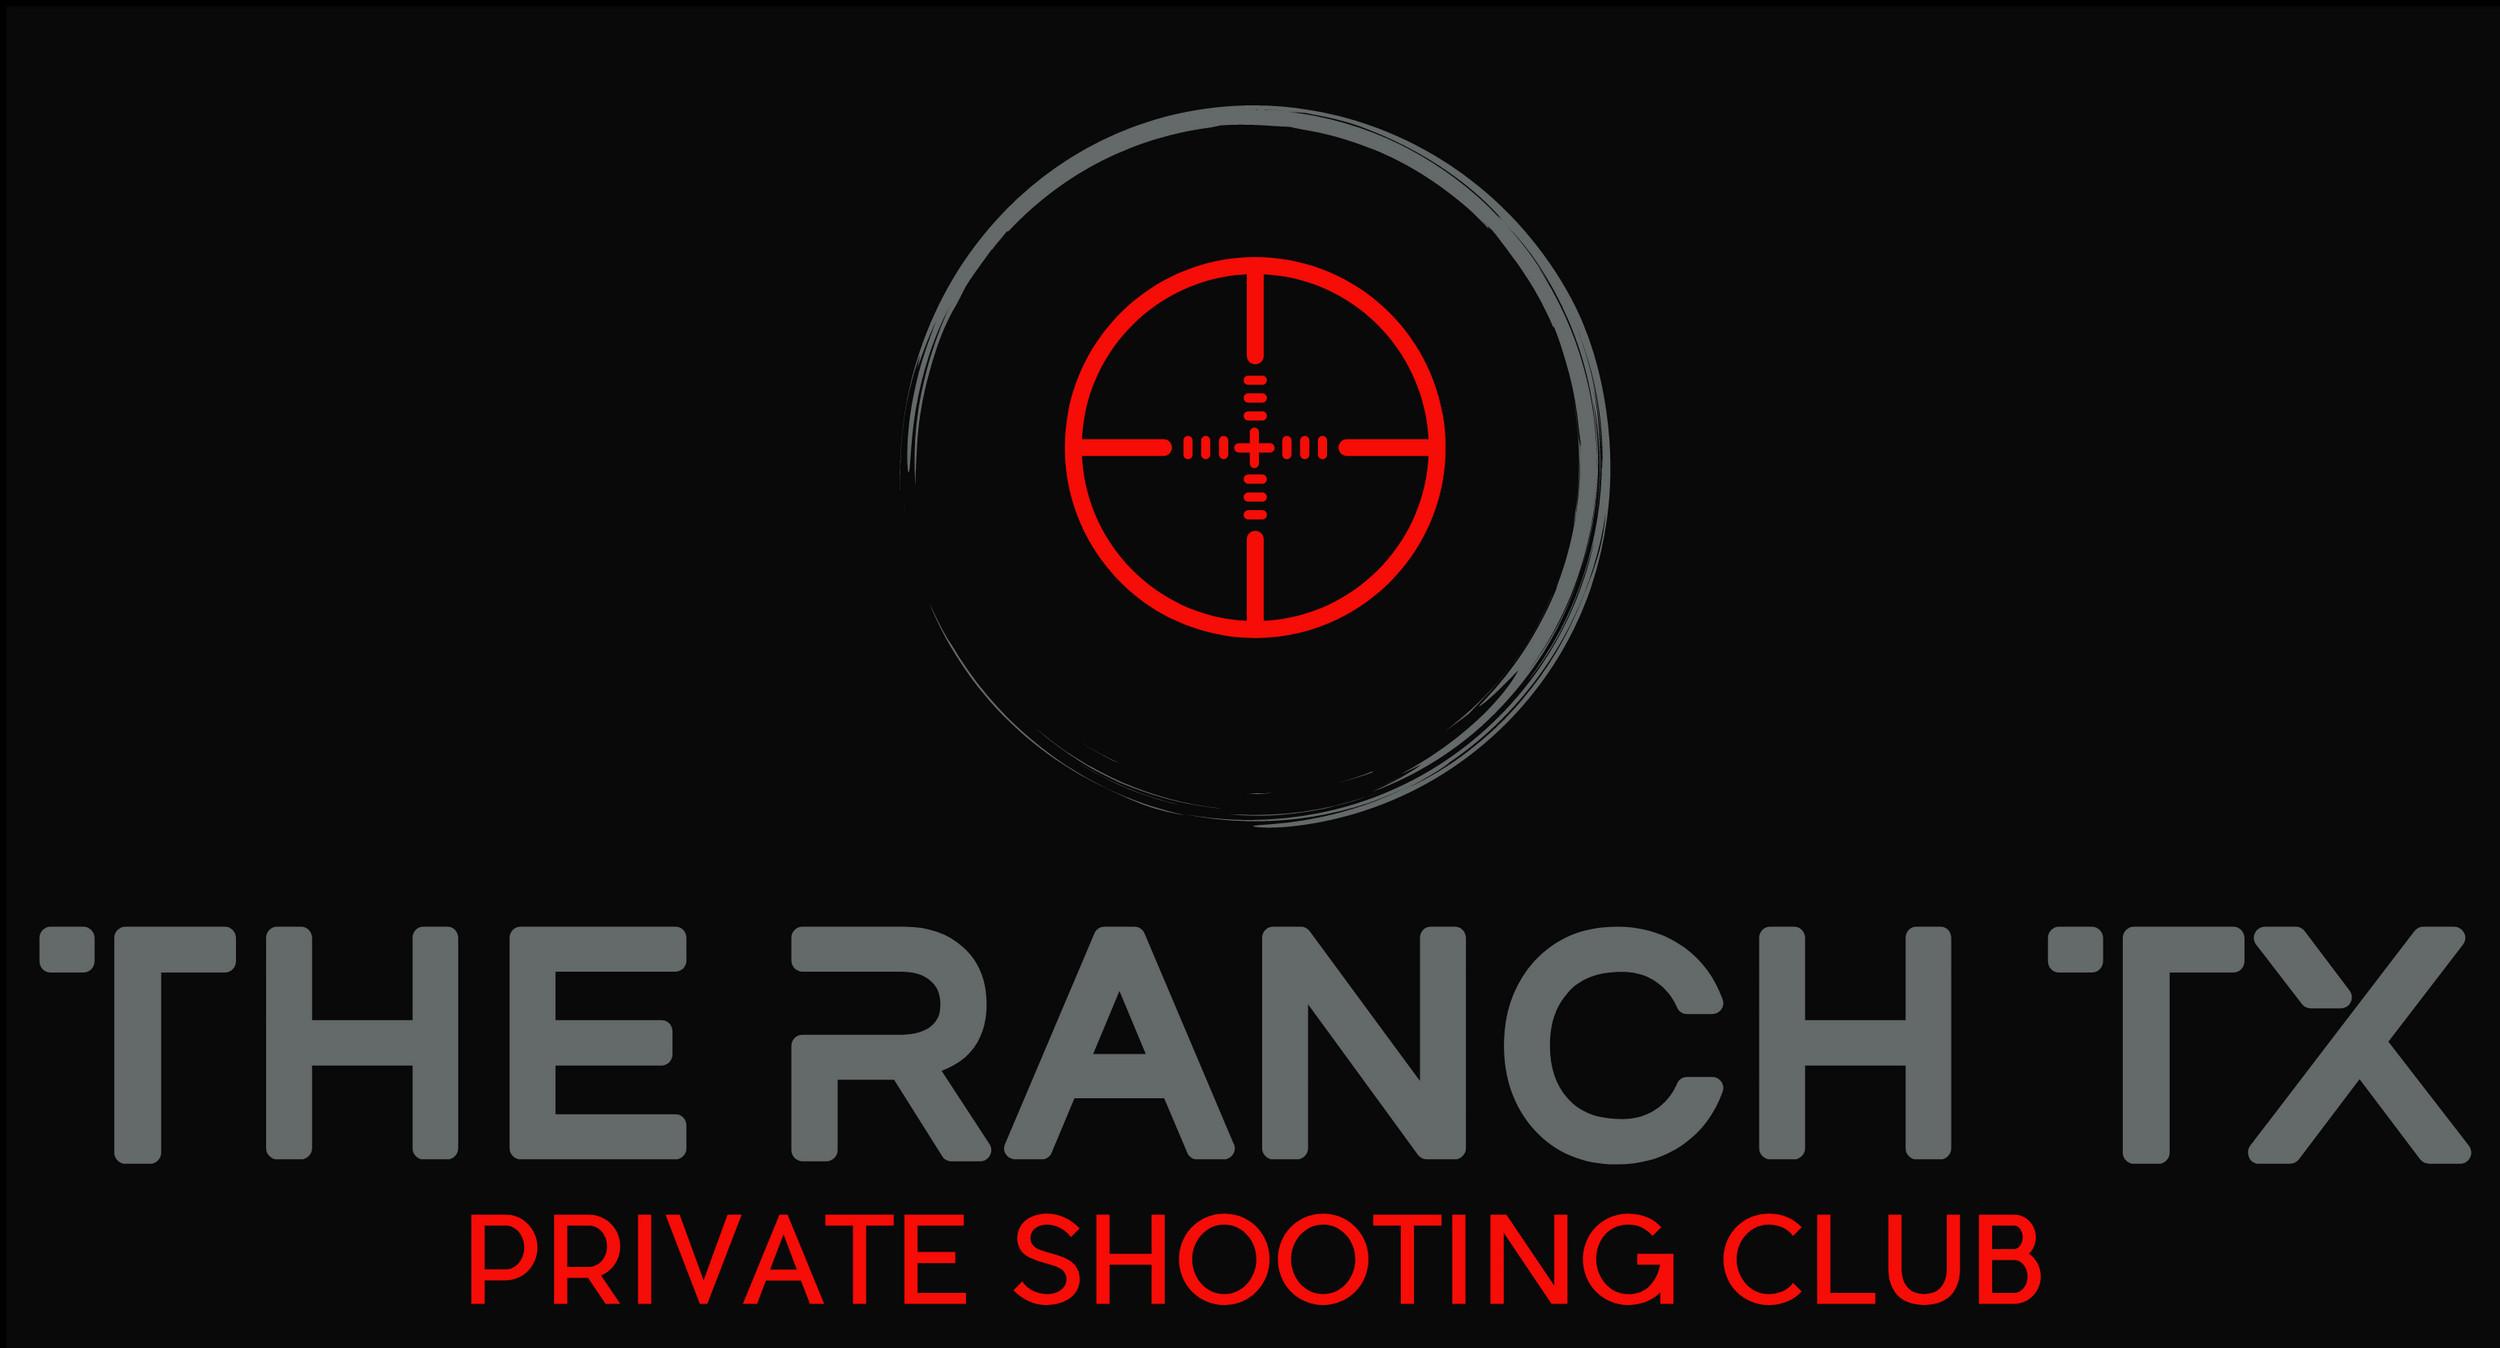 www.theranchtxclub.com